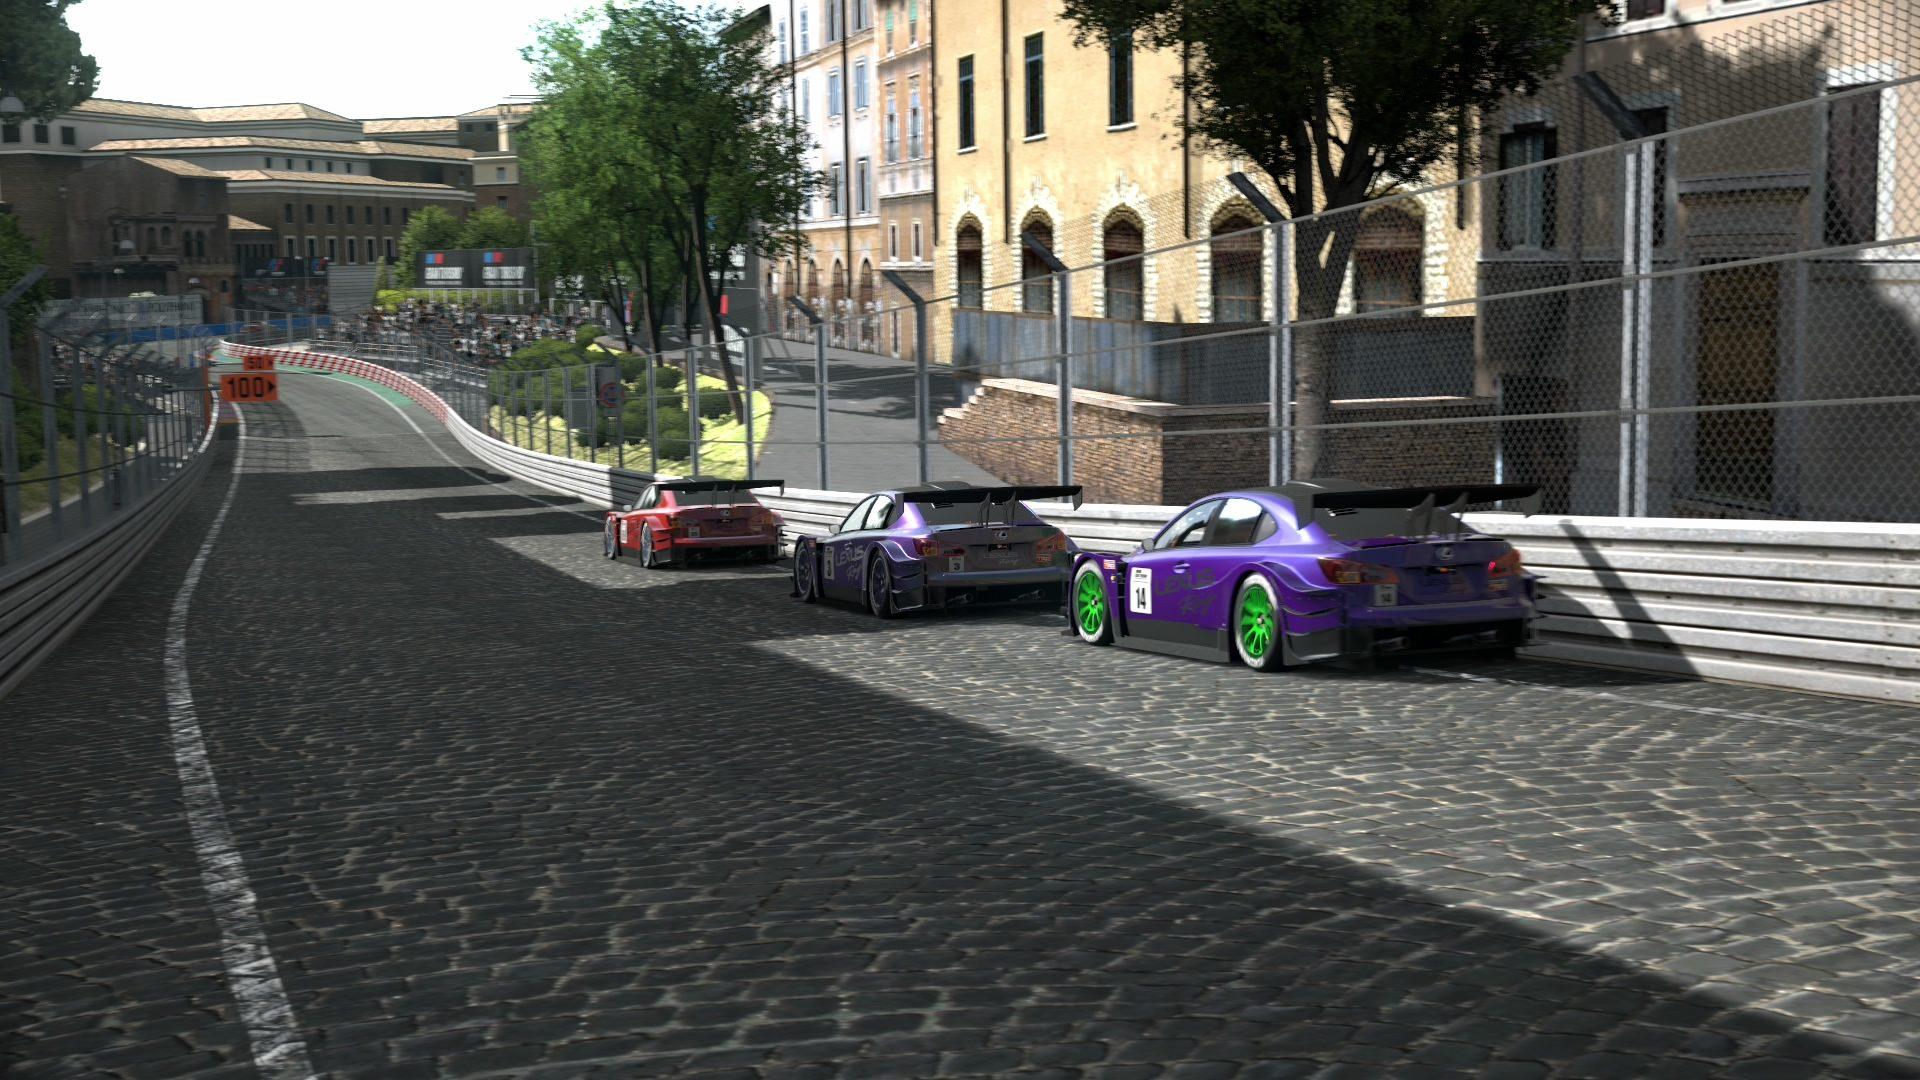 Circuito di Roma_30.jpg